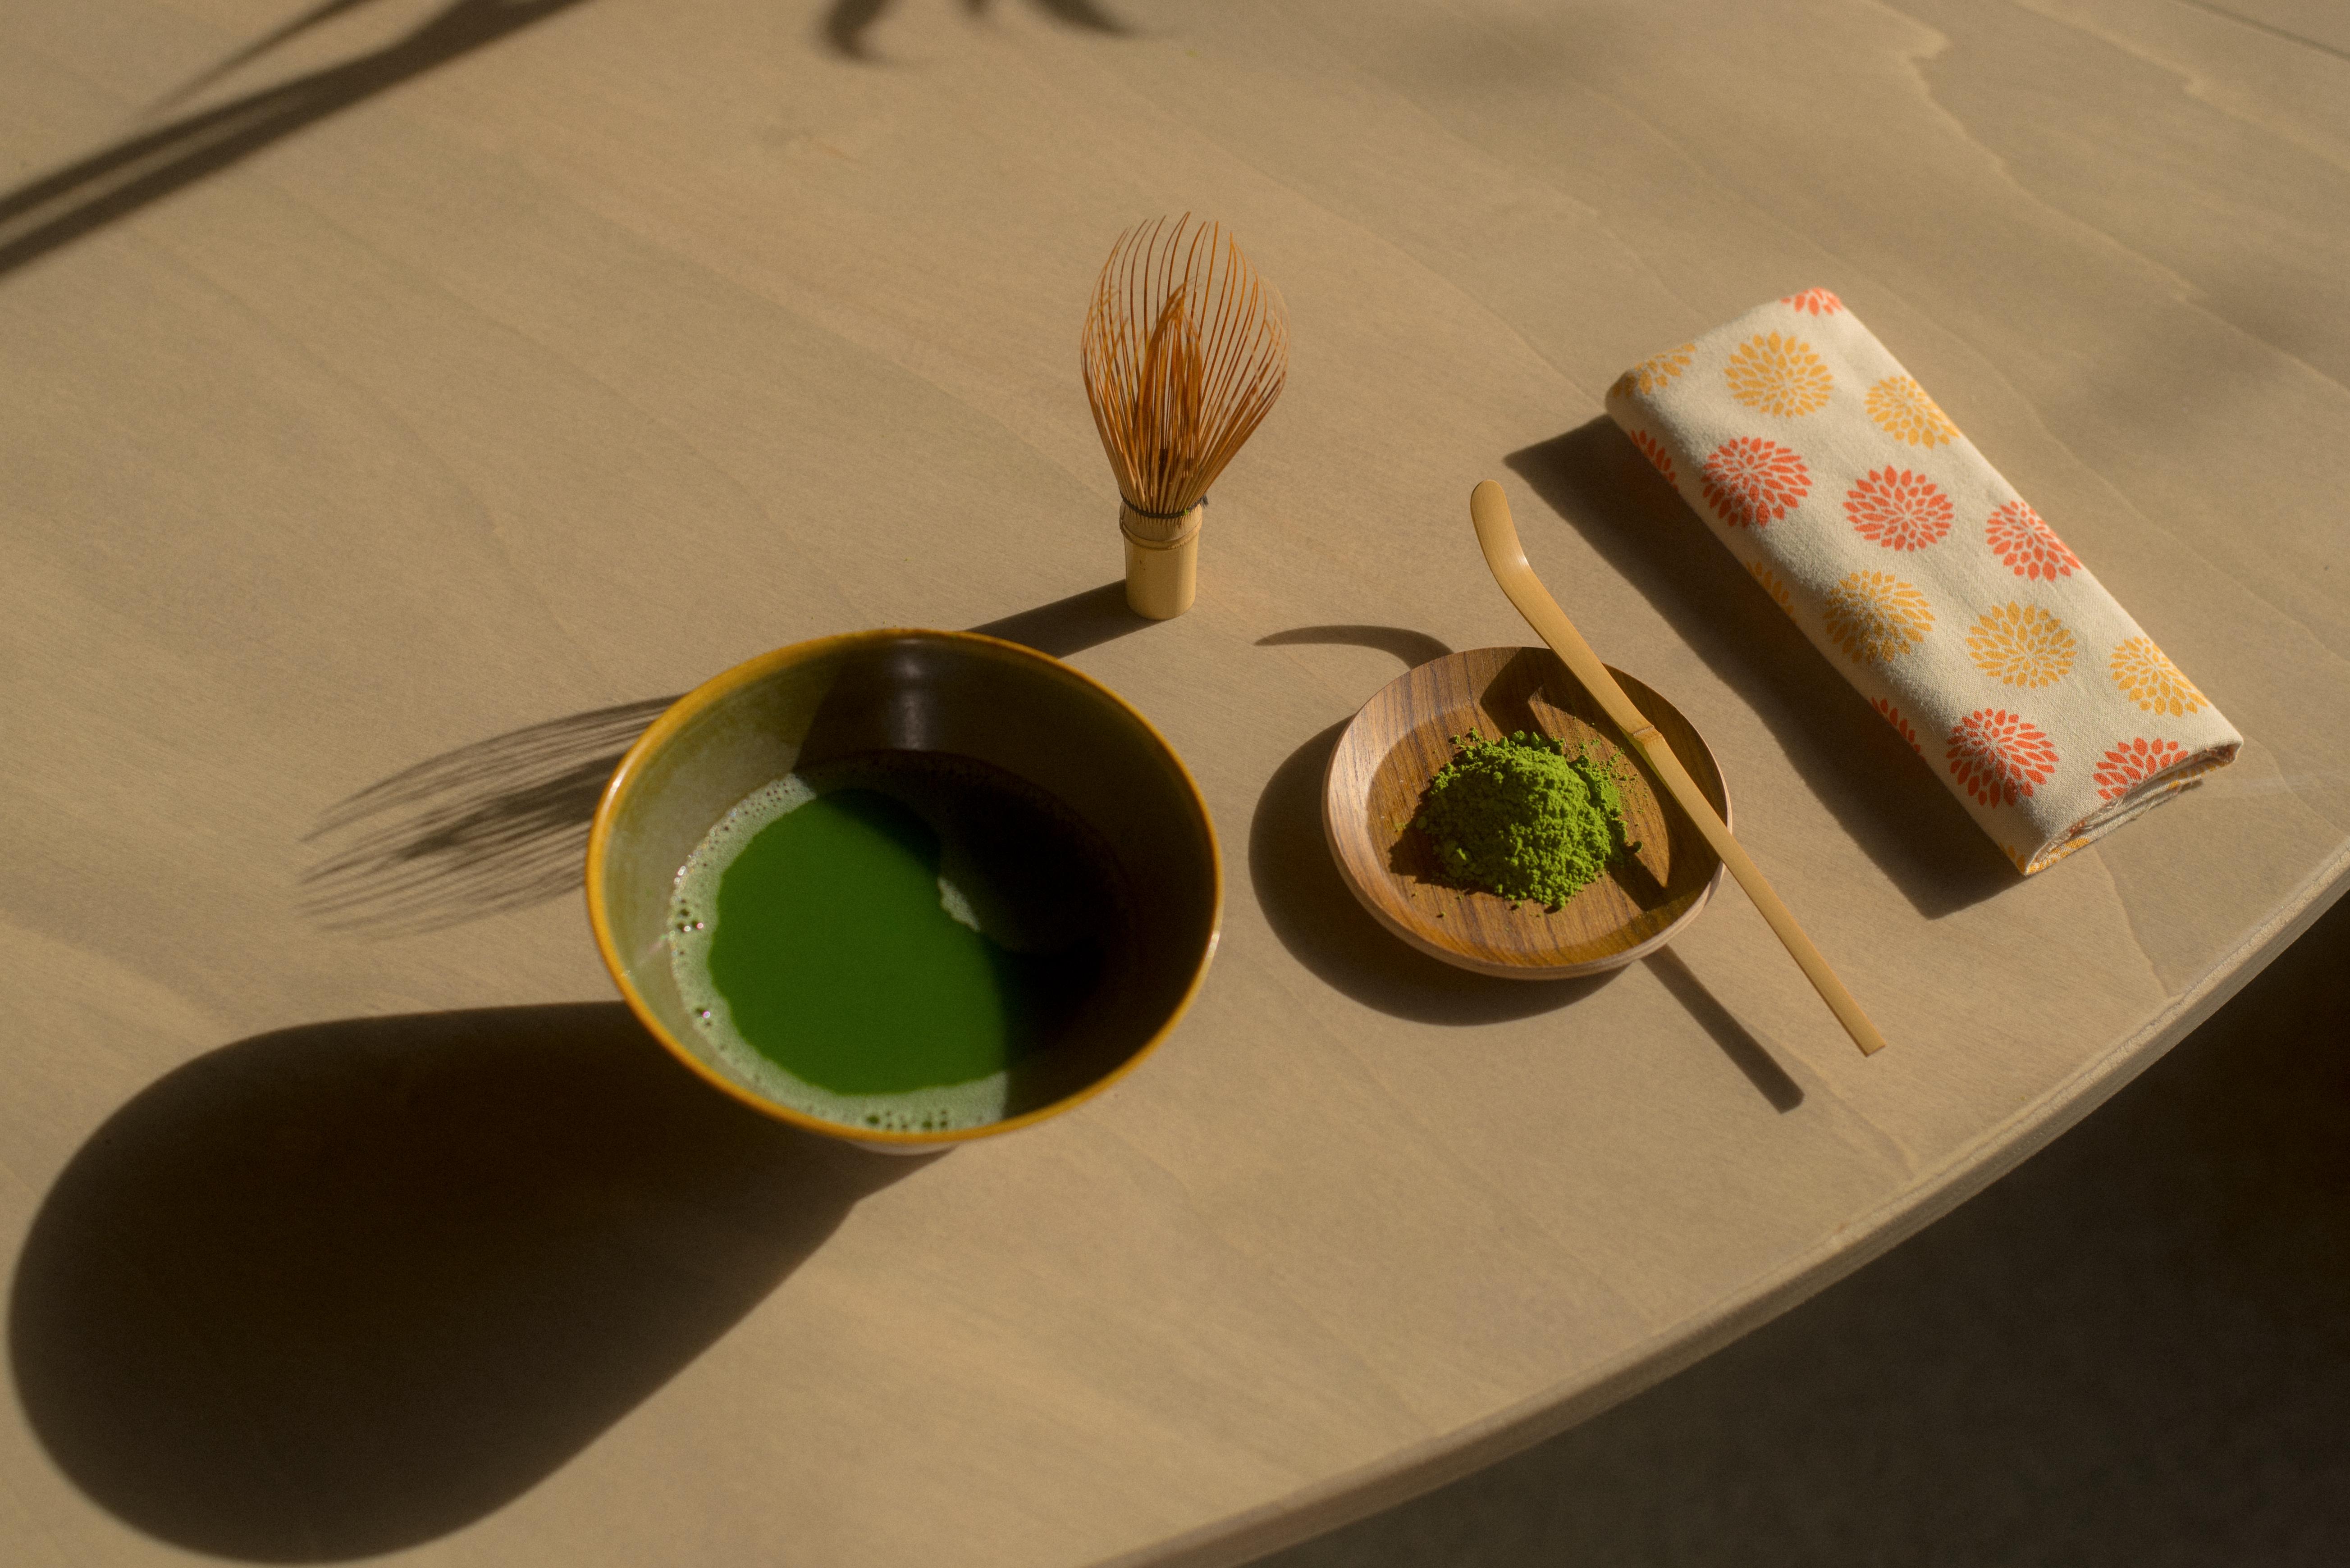 A matcha tea setting showcases a bowl, dried tea and napkin sitting on a table.